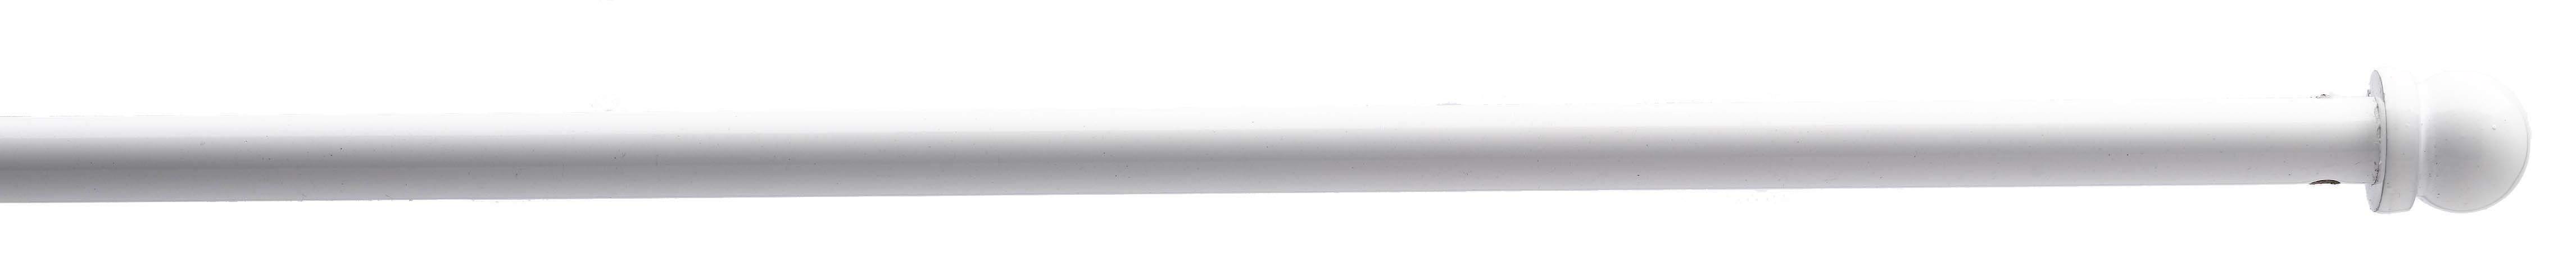 Barra de cortina redonda blanco blanco cortina casa venta en l nea de barra para visillos - Barras para visillos ...